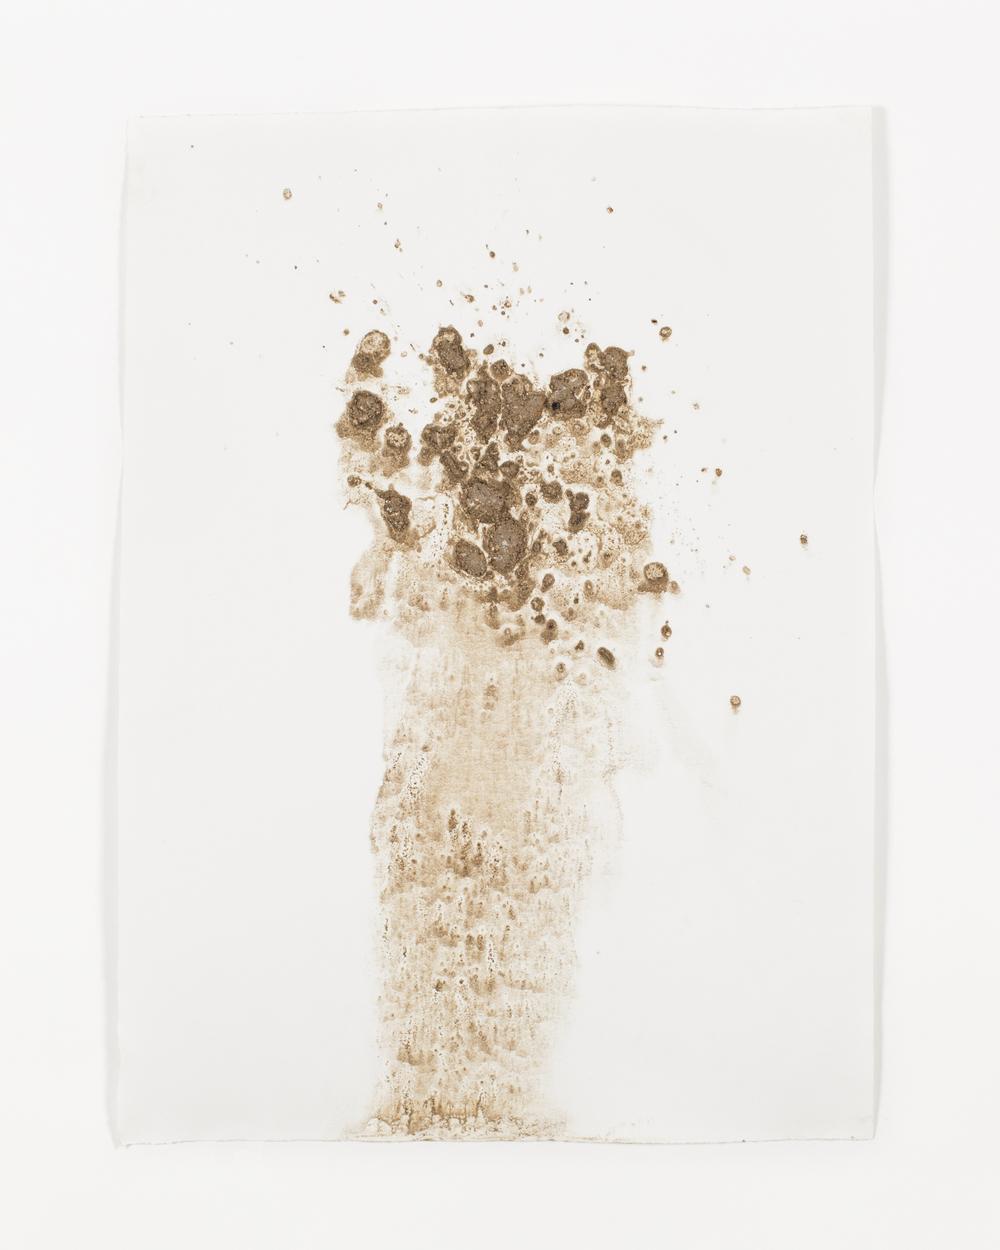 dirtprint3.jpg